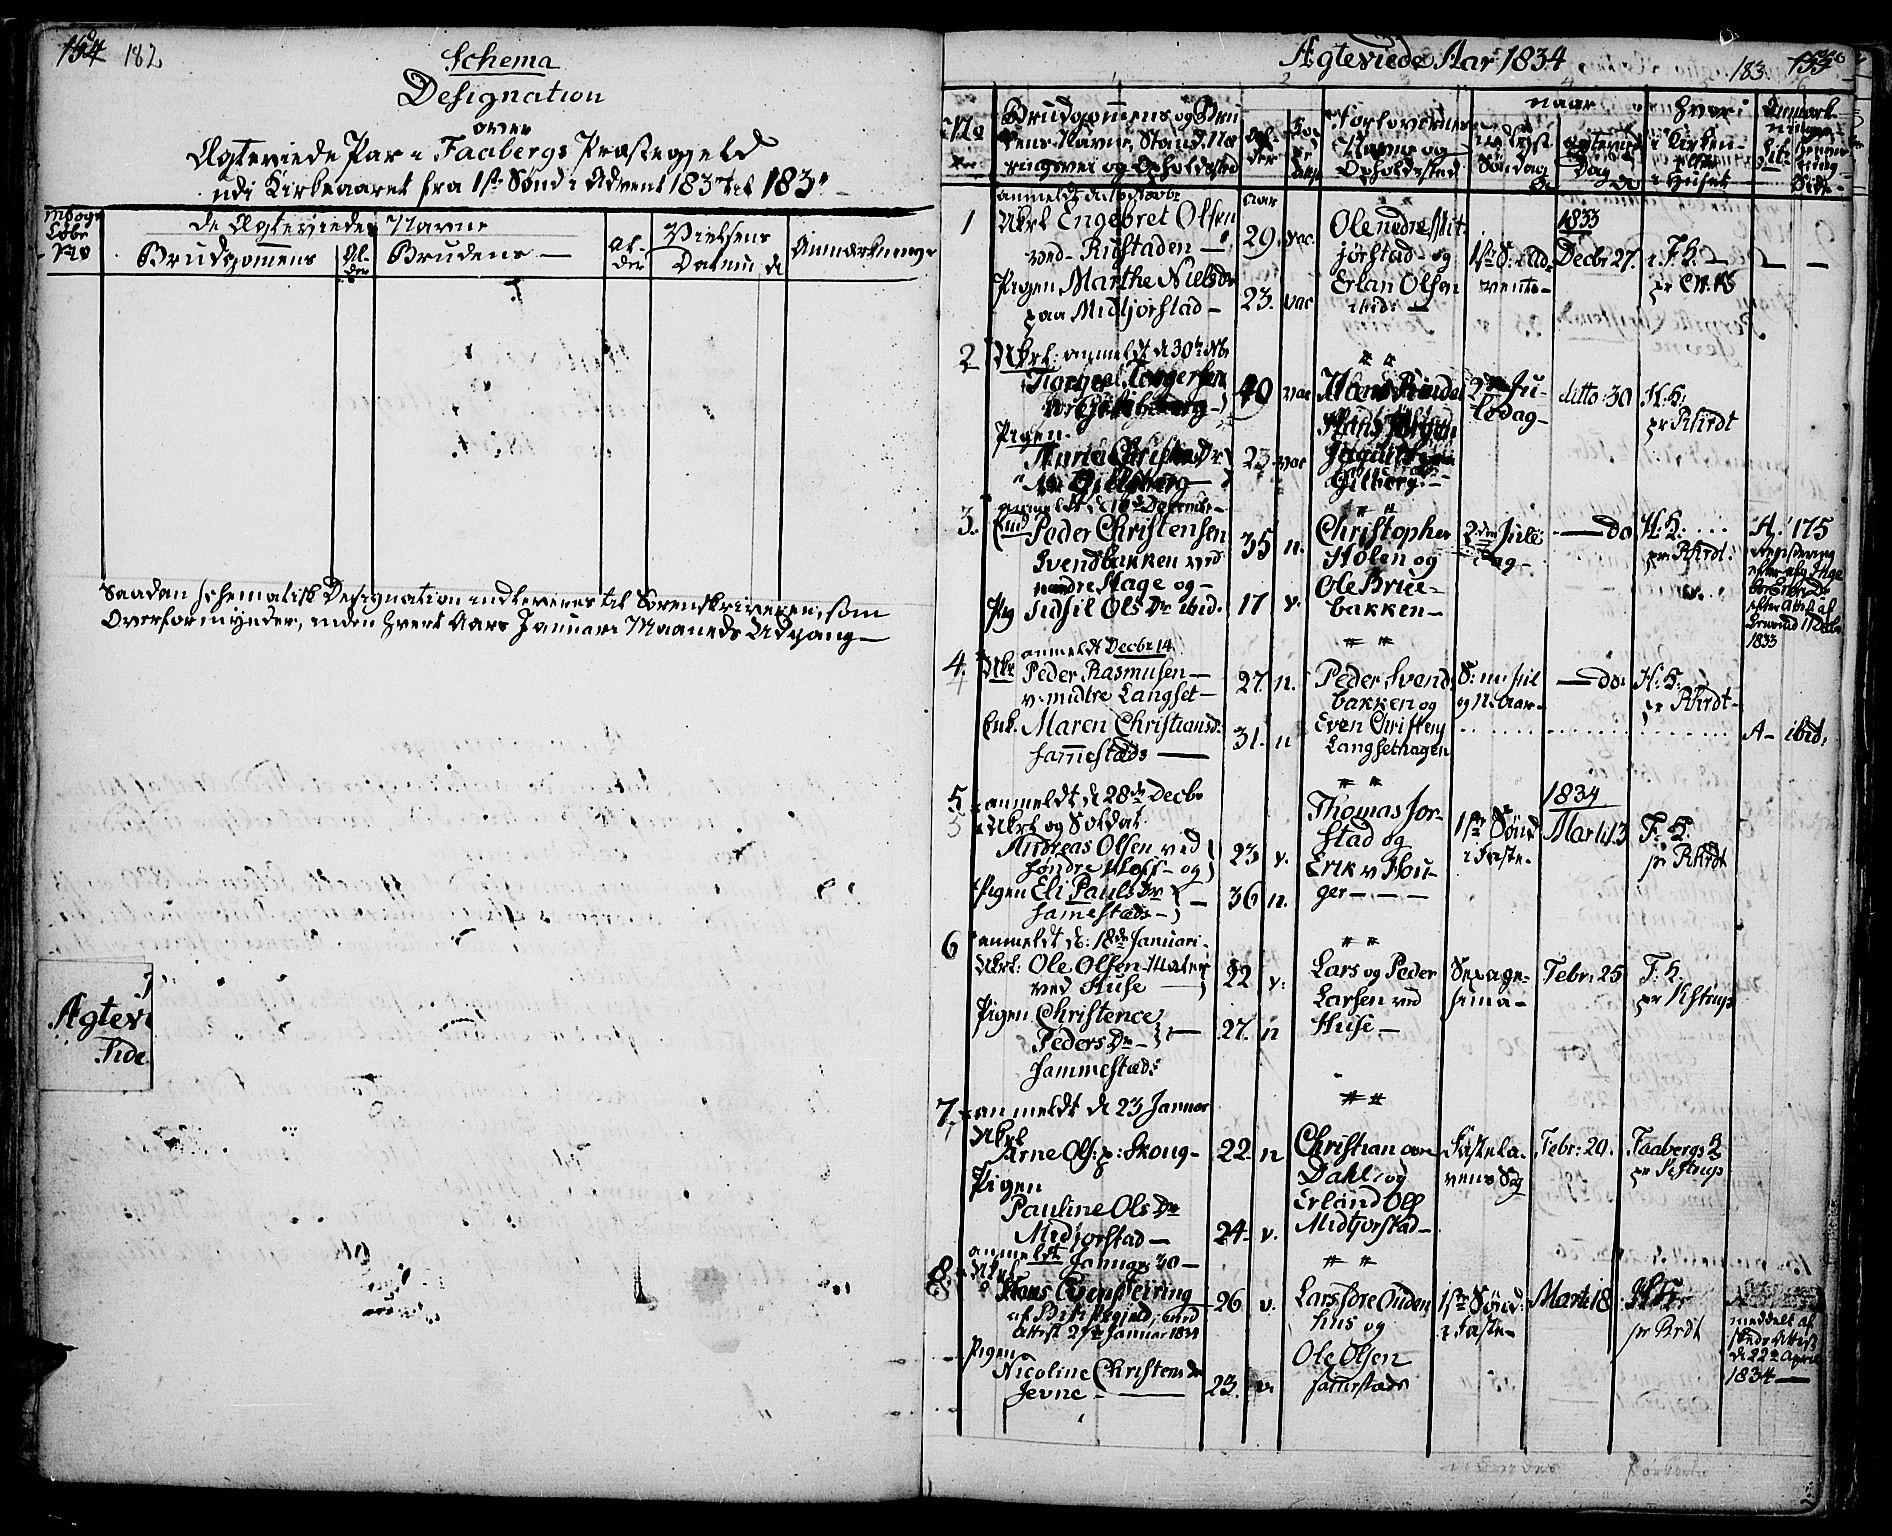 SAH, Fåberg prestekontor, Ministerialbok nr. 4, 1833-1837, s. 182-183